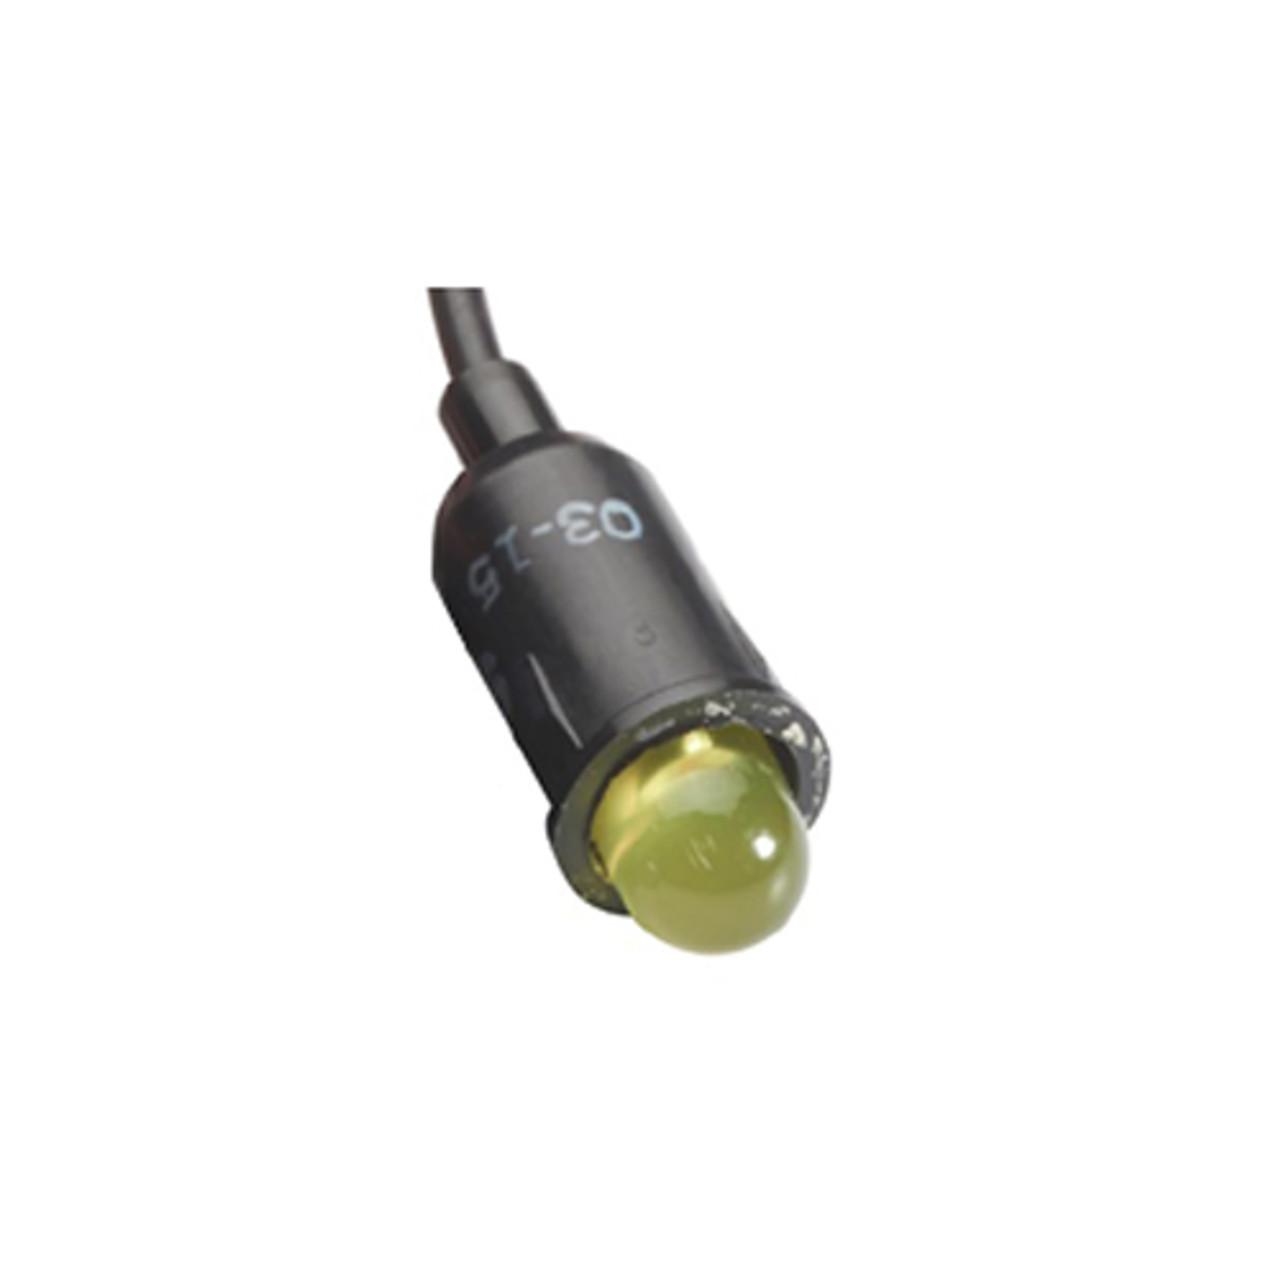 ASP-LDY ASP Alarm Control Yellow LED